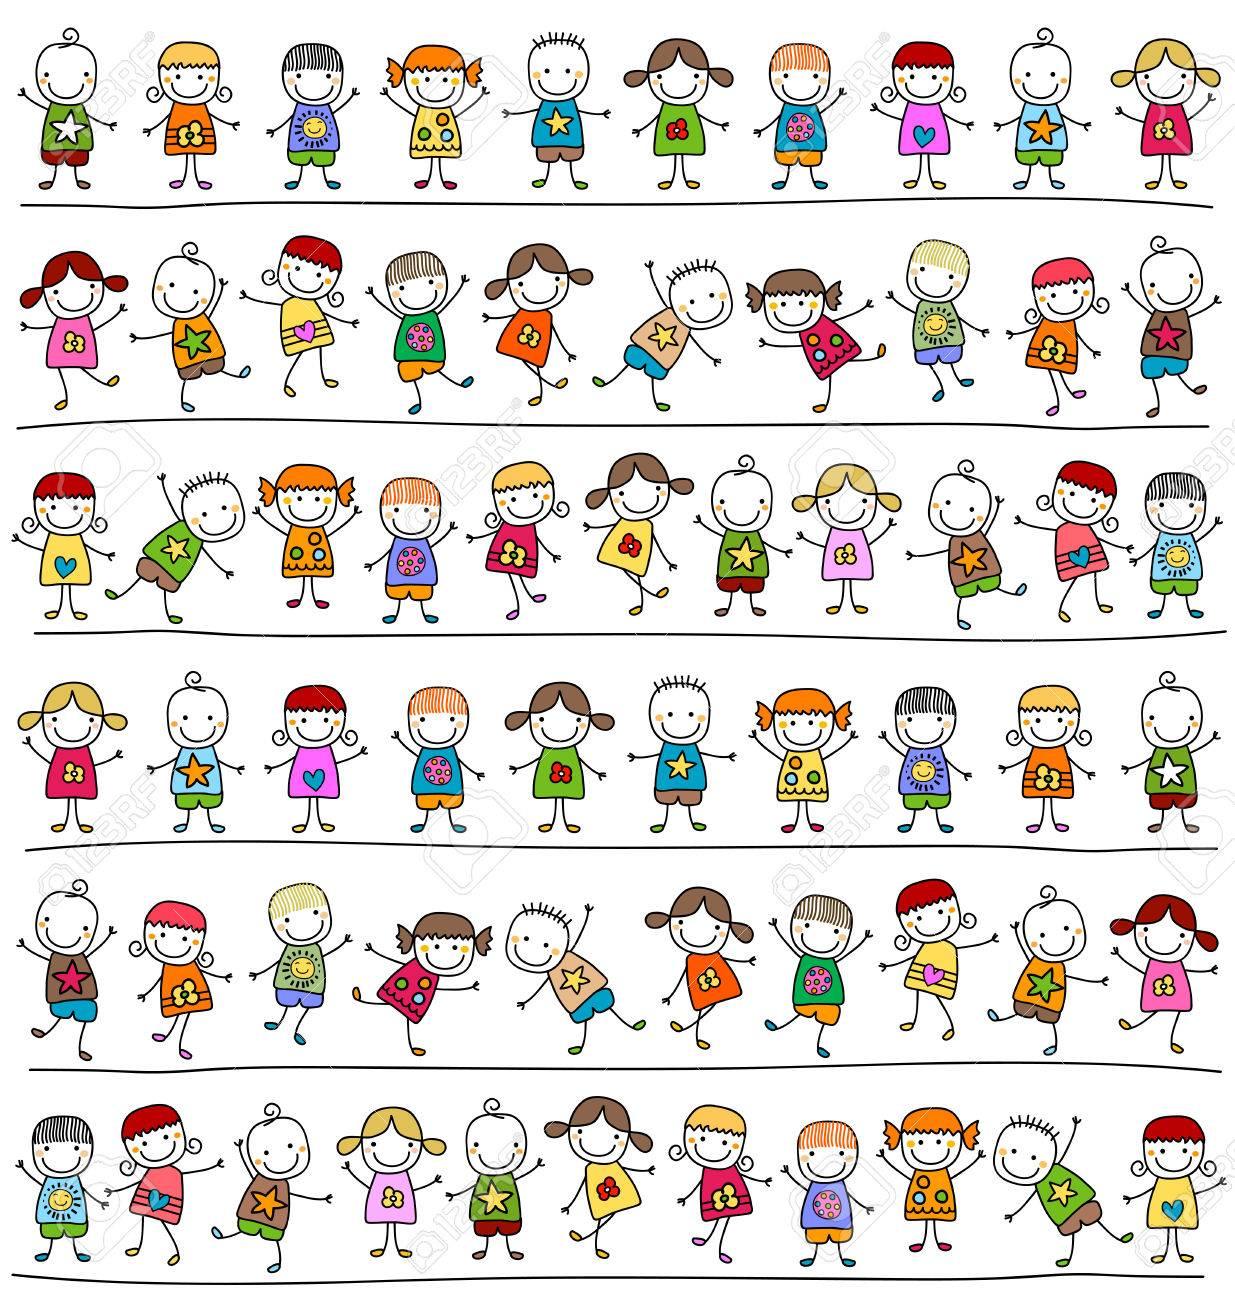 cute kids pattern, childlike style drawing - 39585645